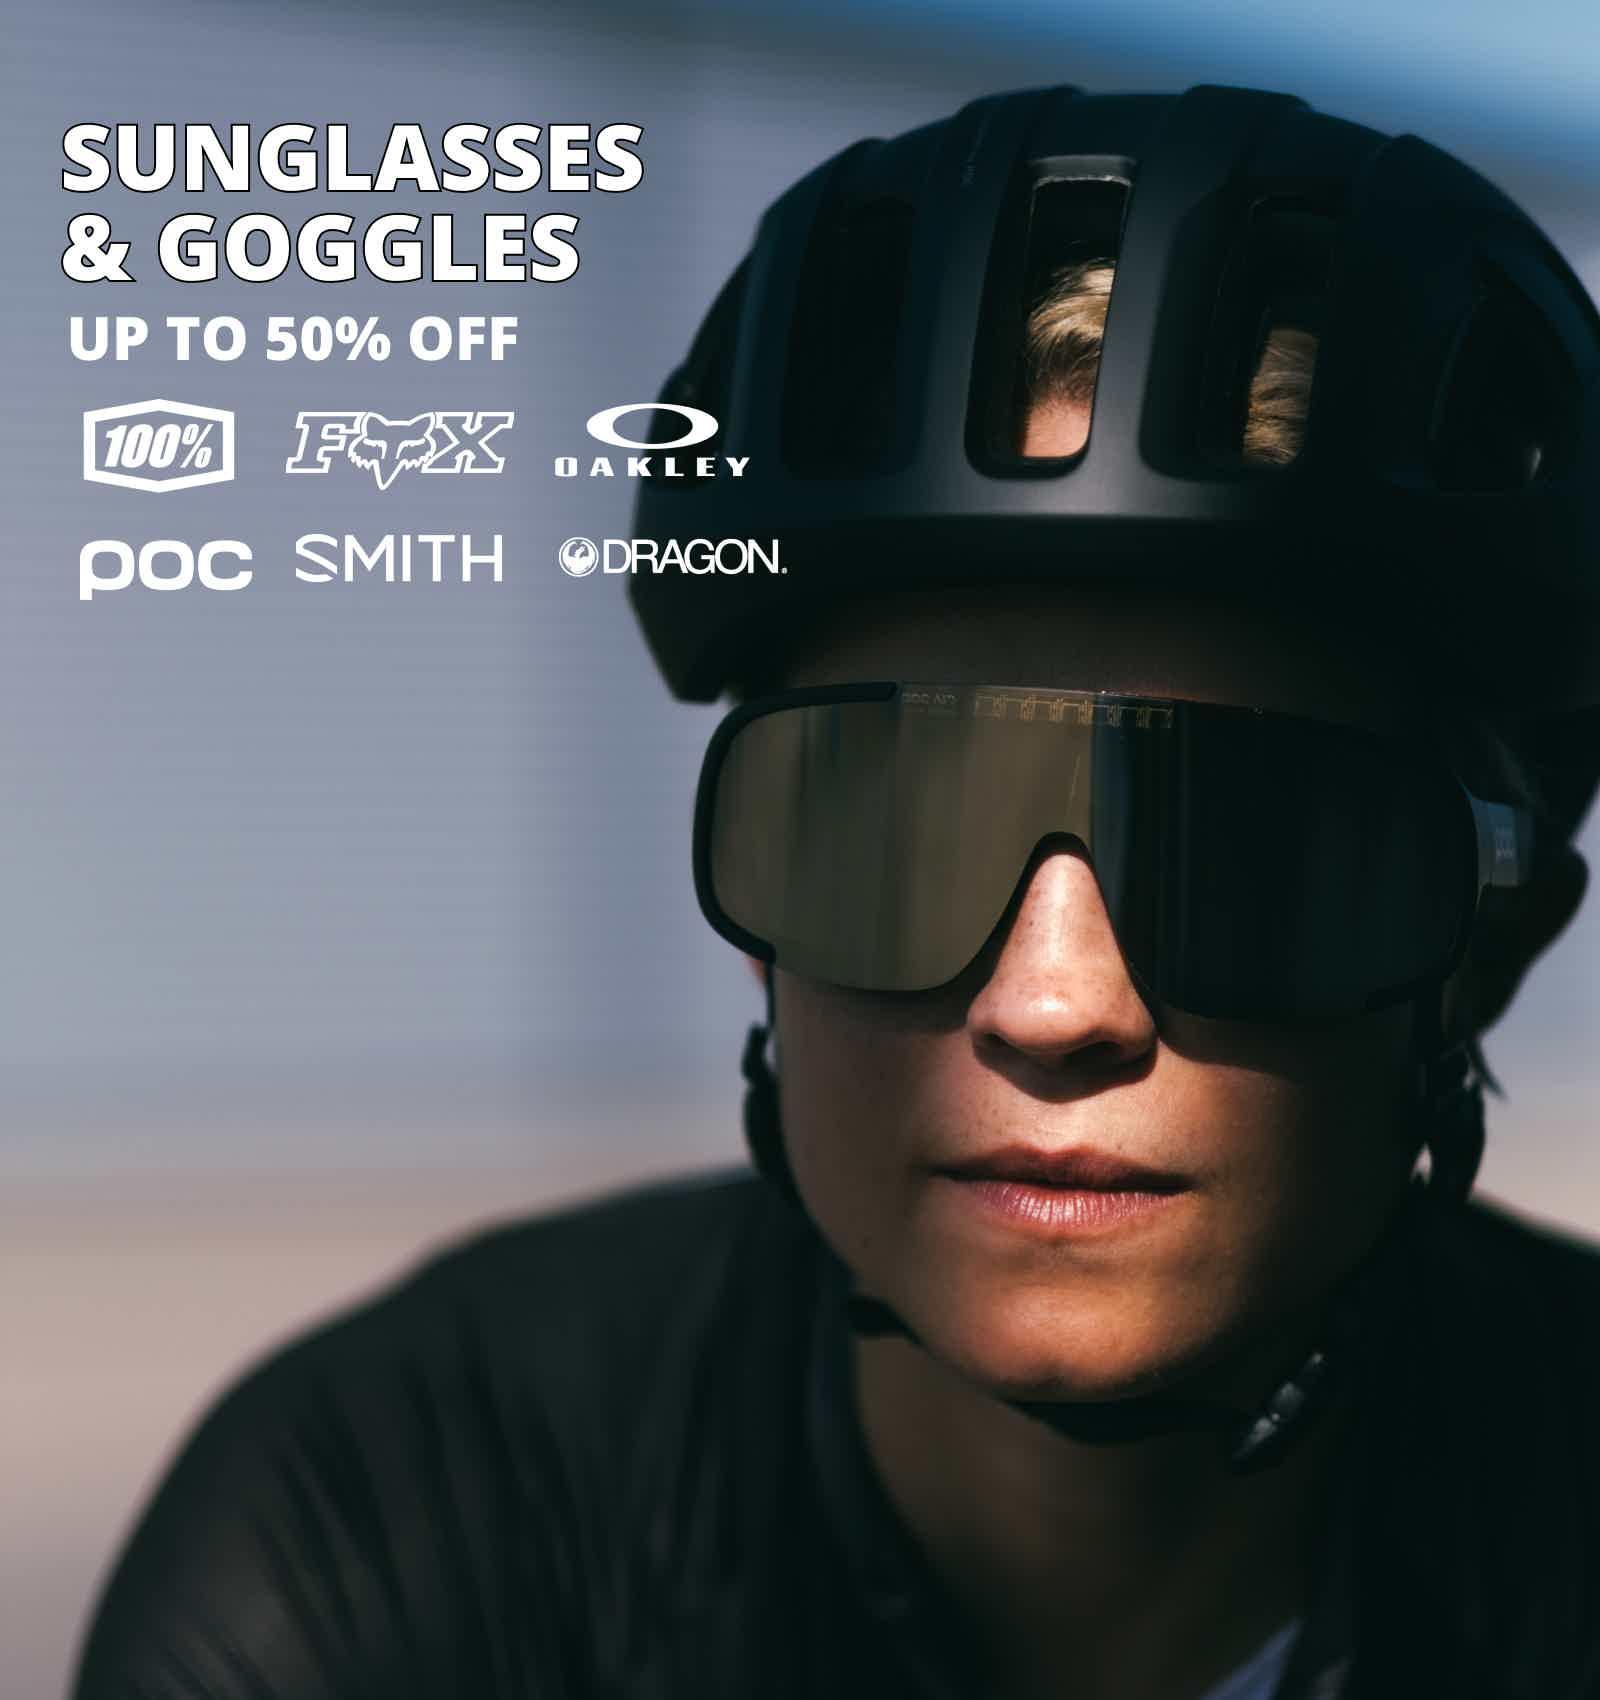 Sunglasses & Optics